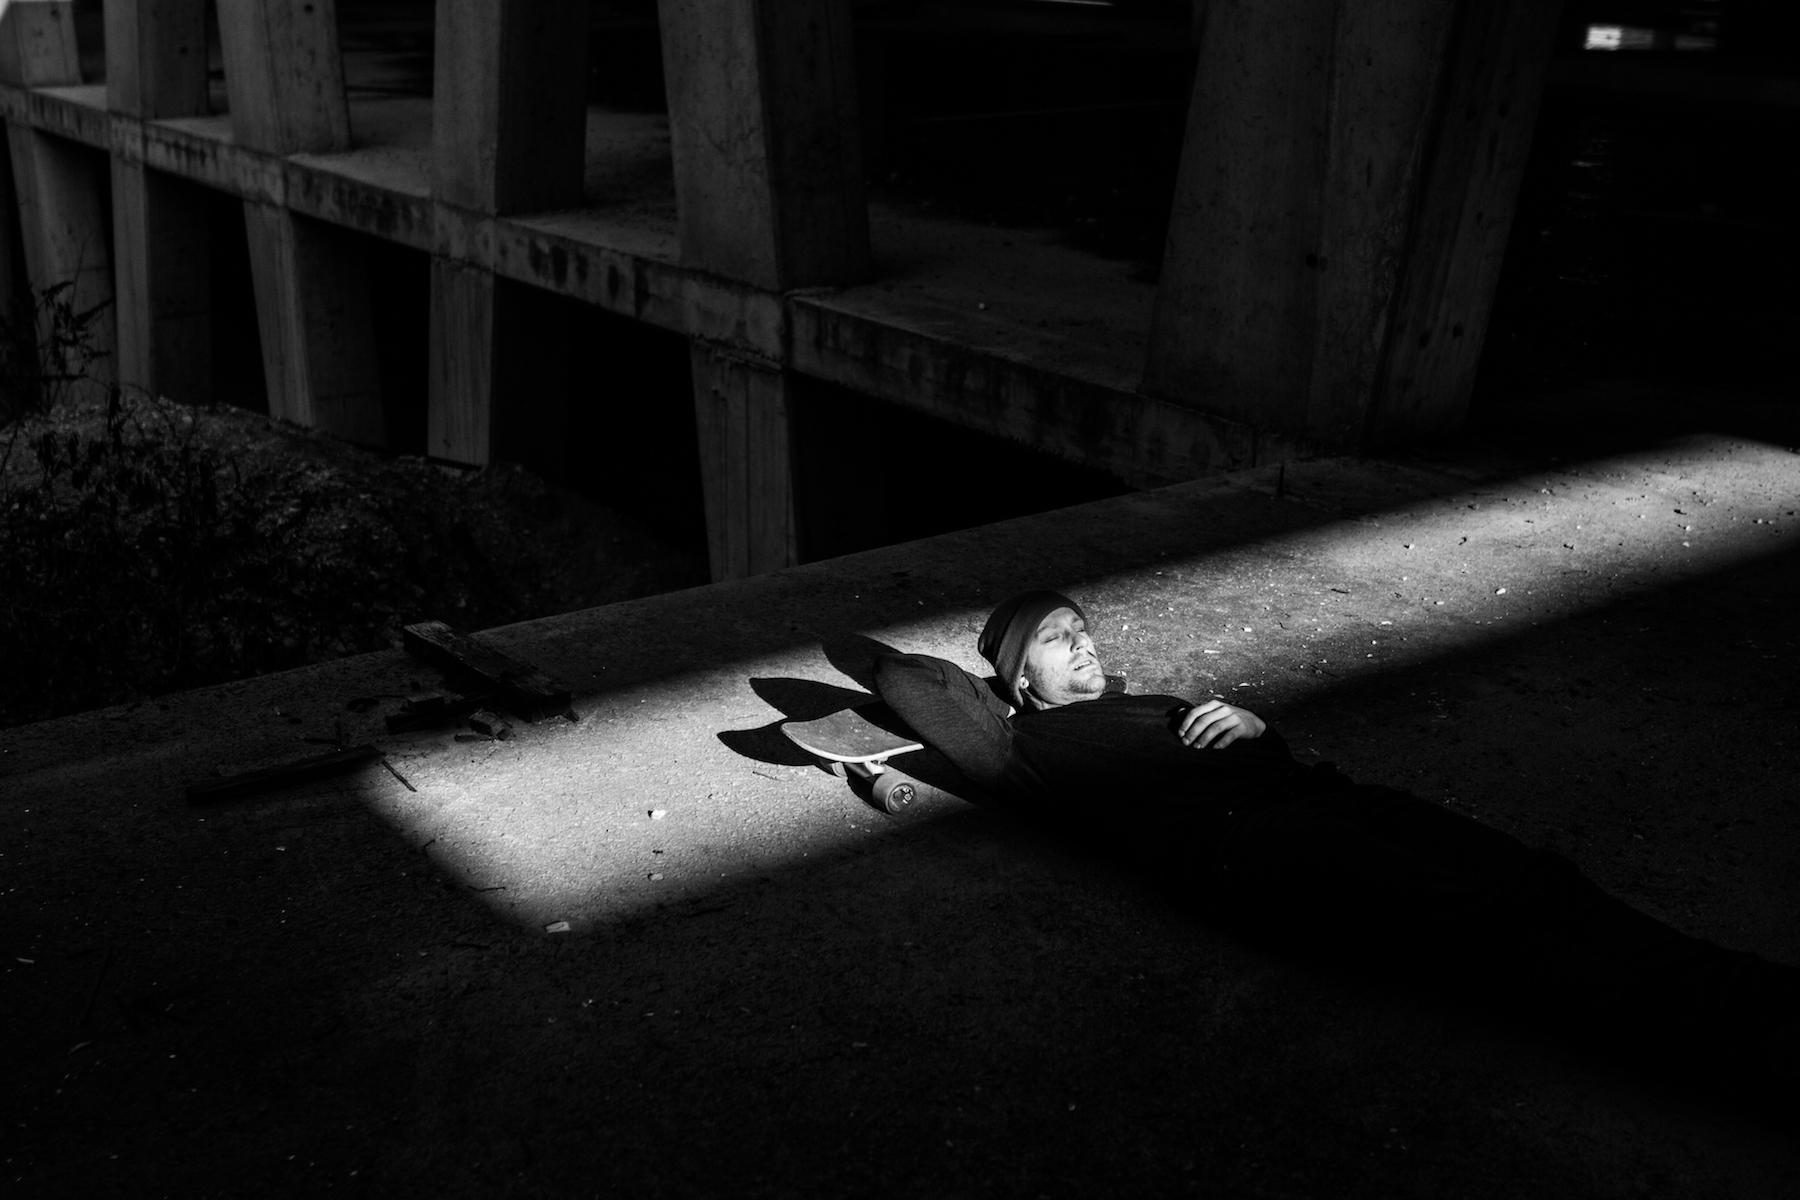 luke-paige-skate-photography-10